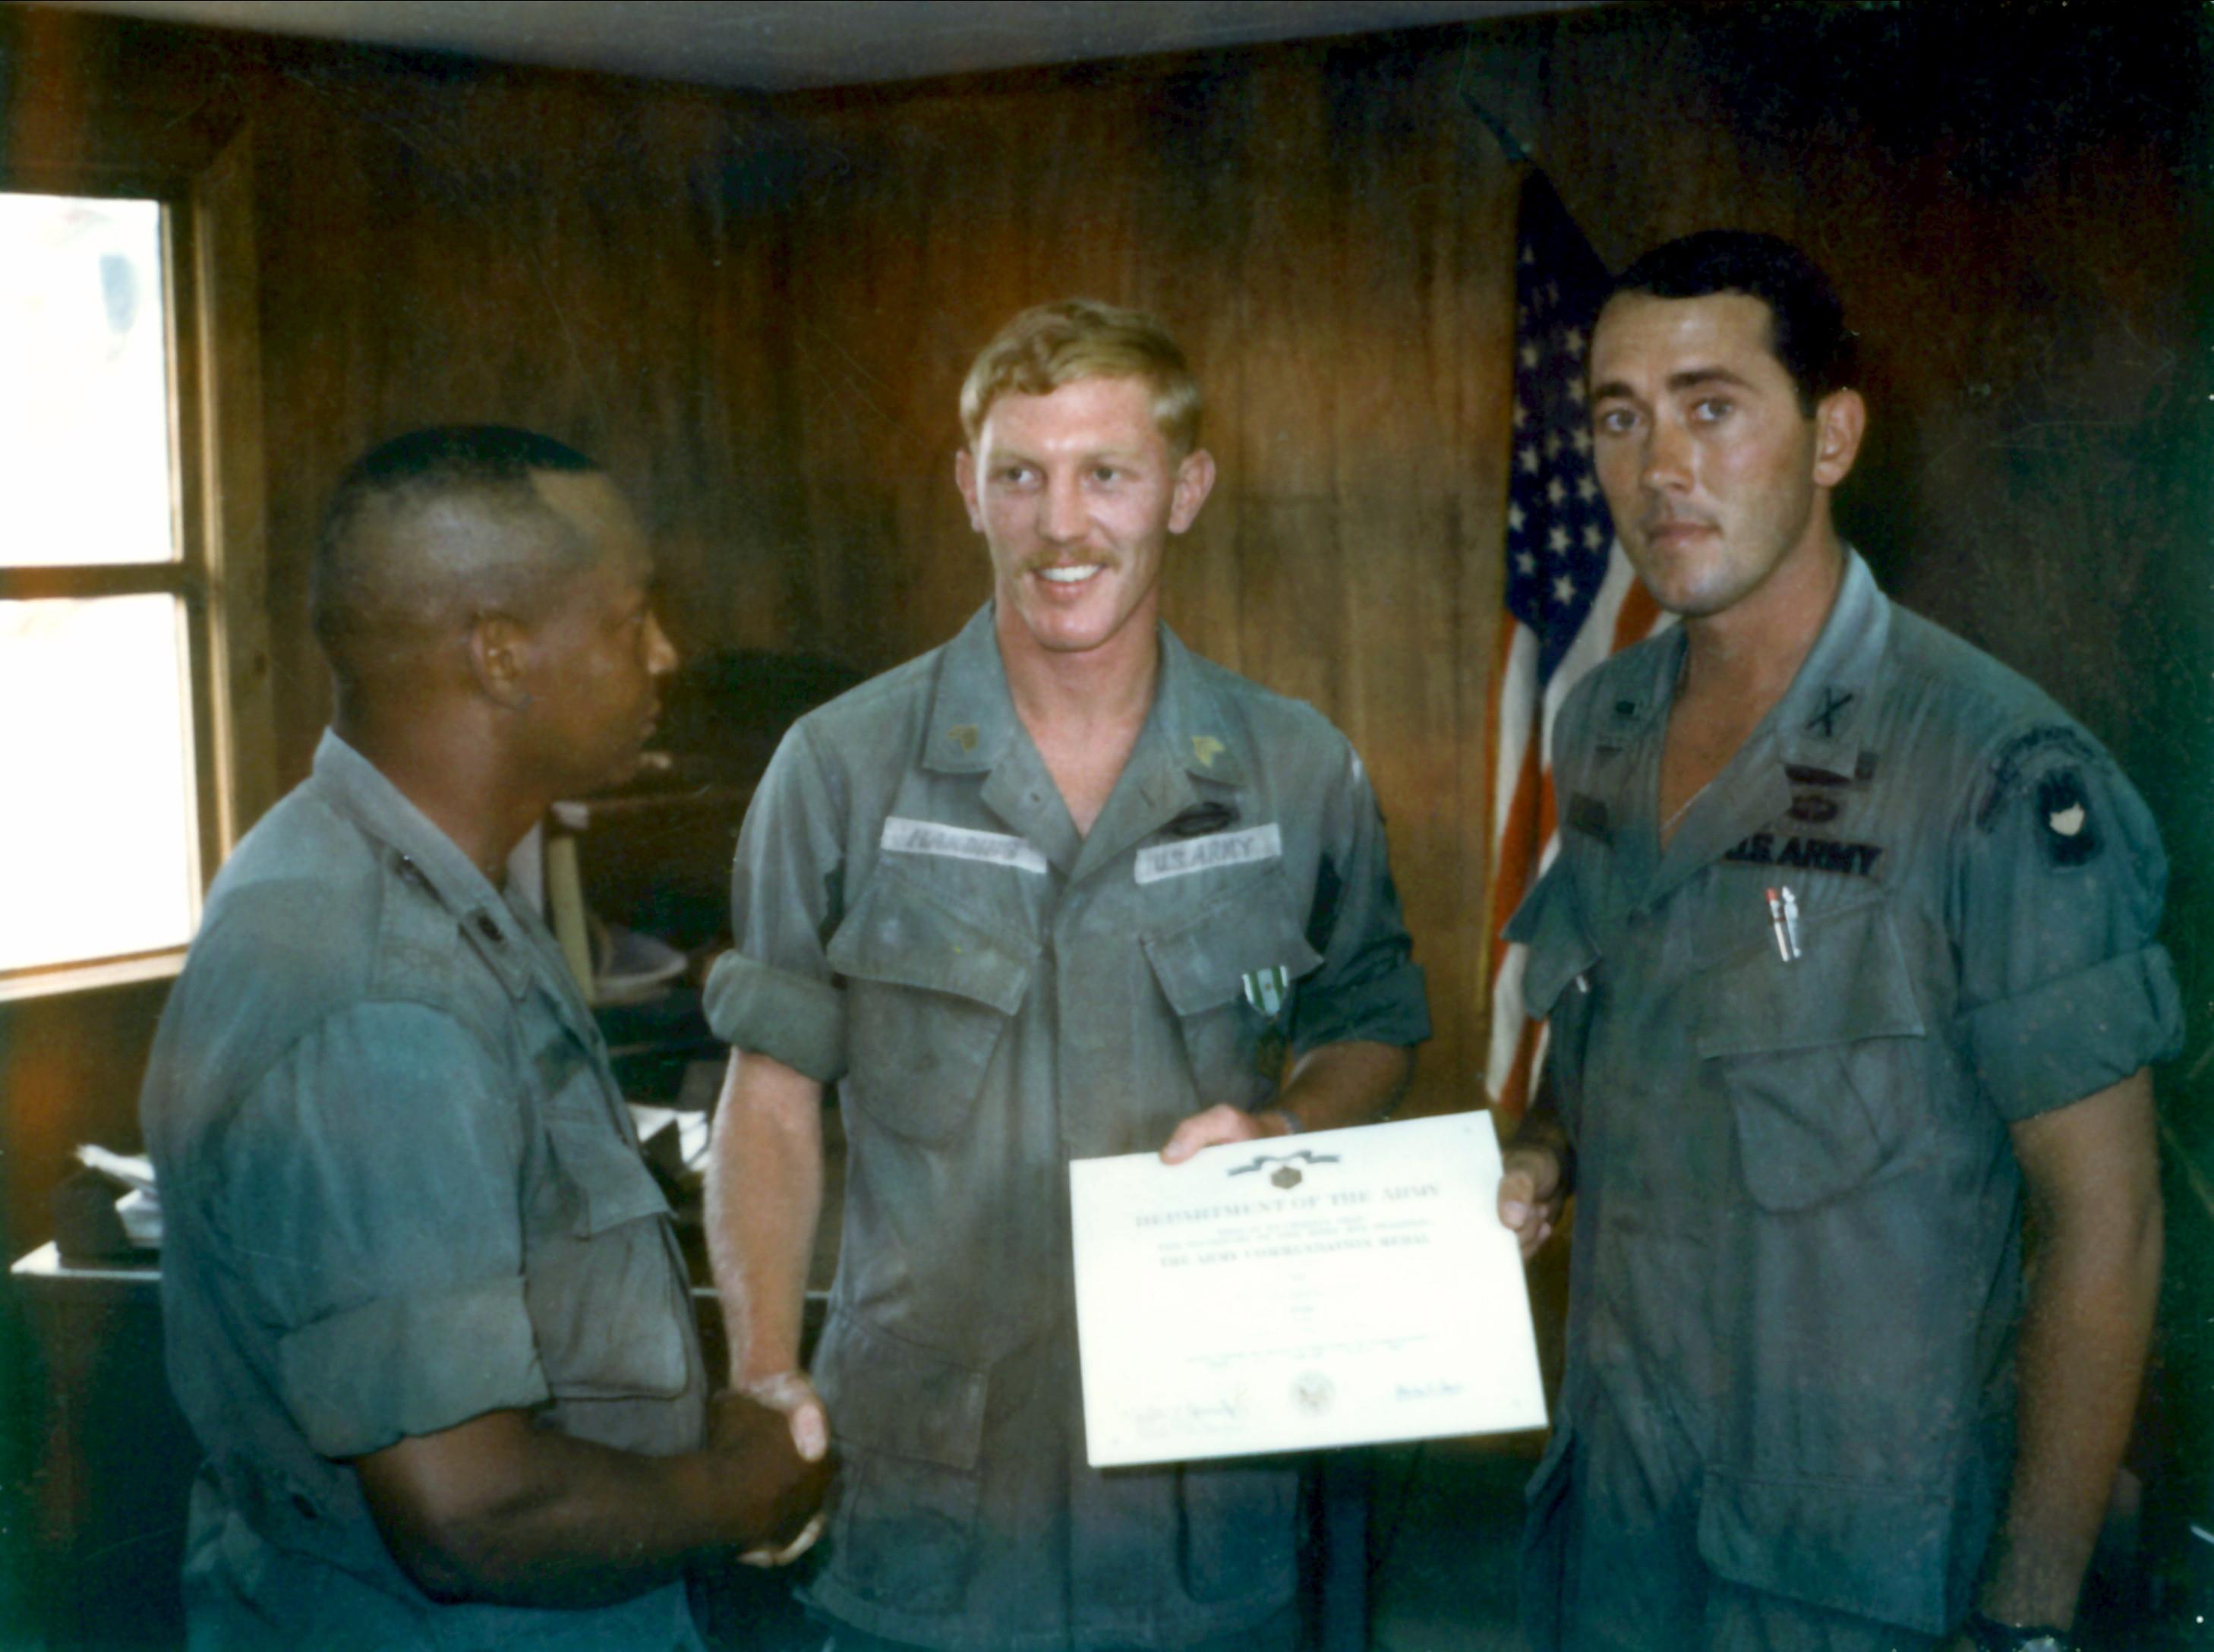 49th IPSD scout dog handler Sgt Bill Har